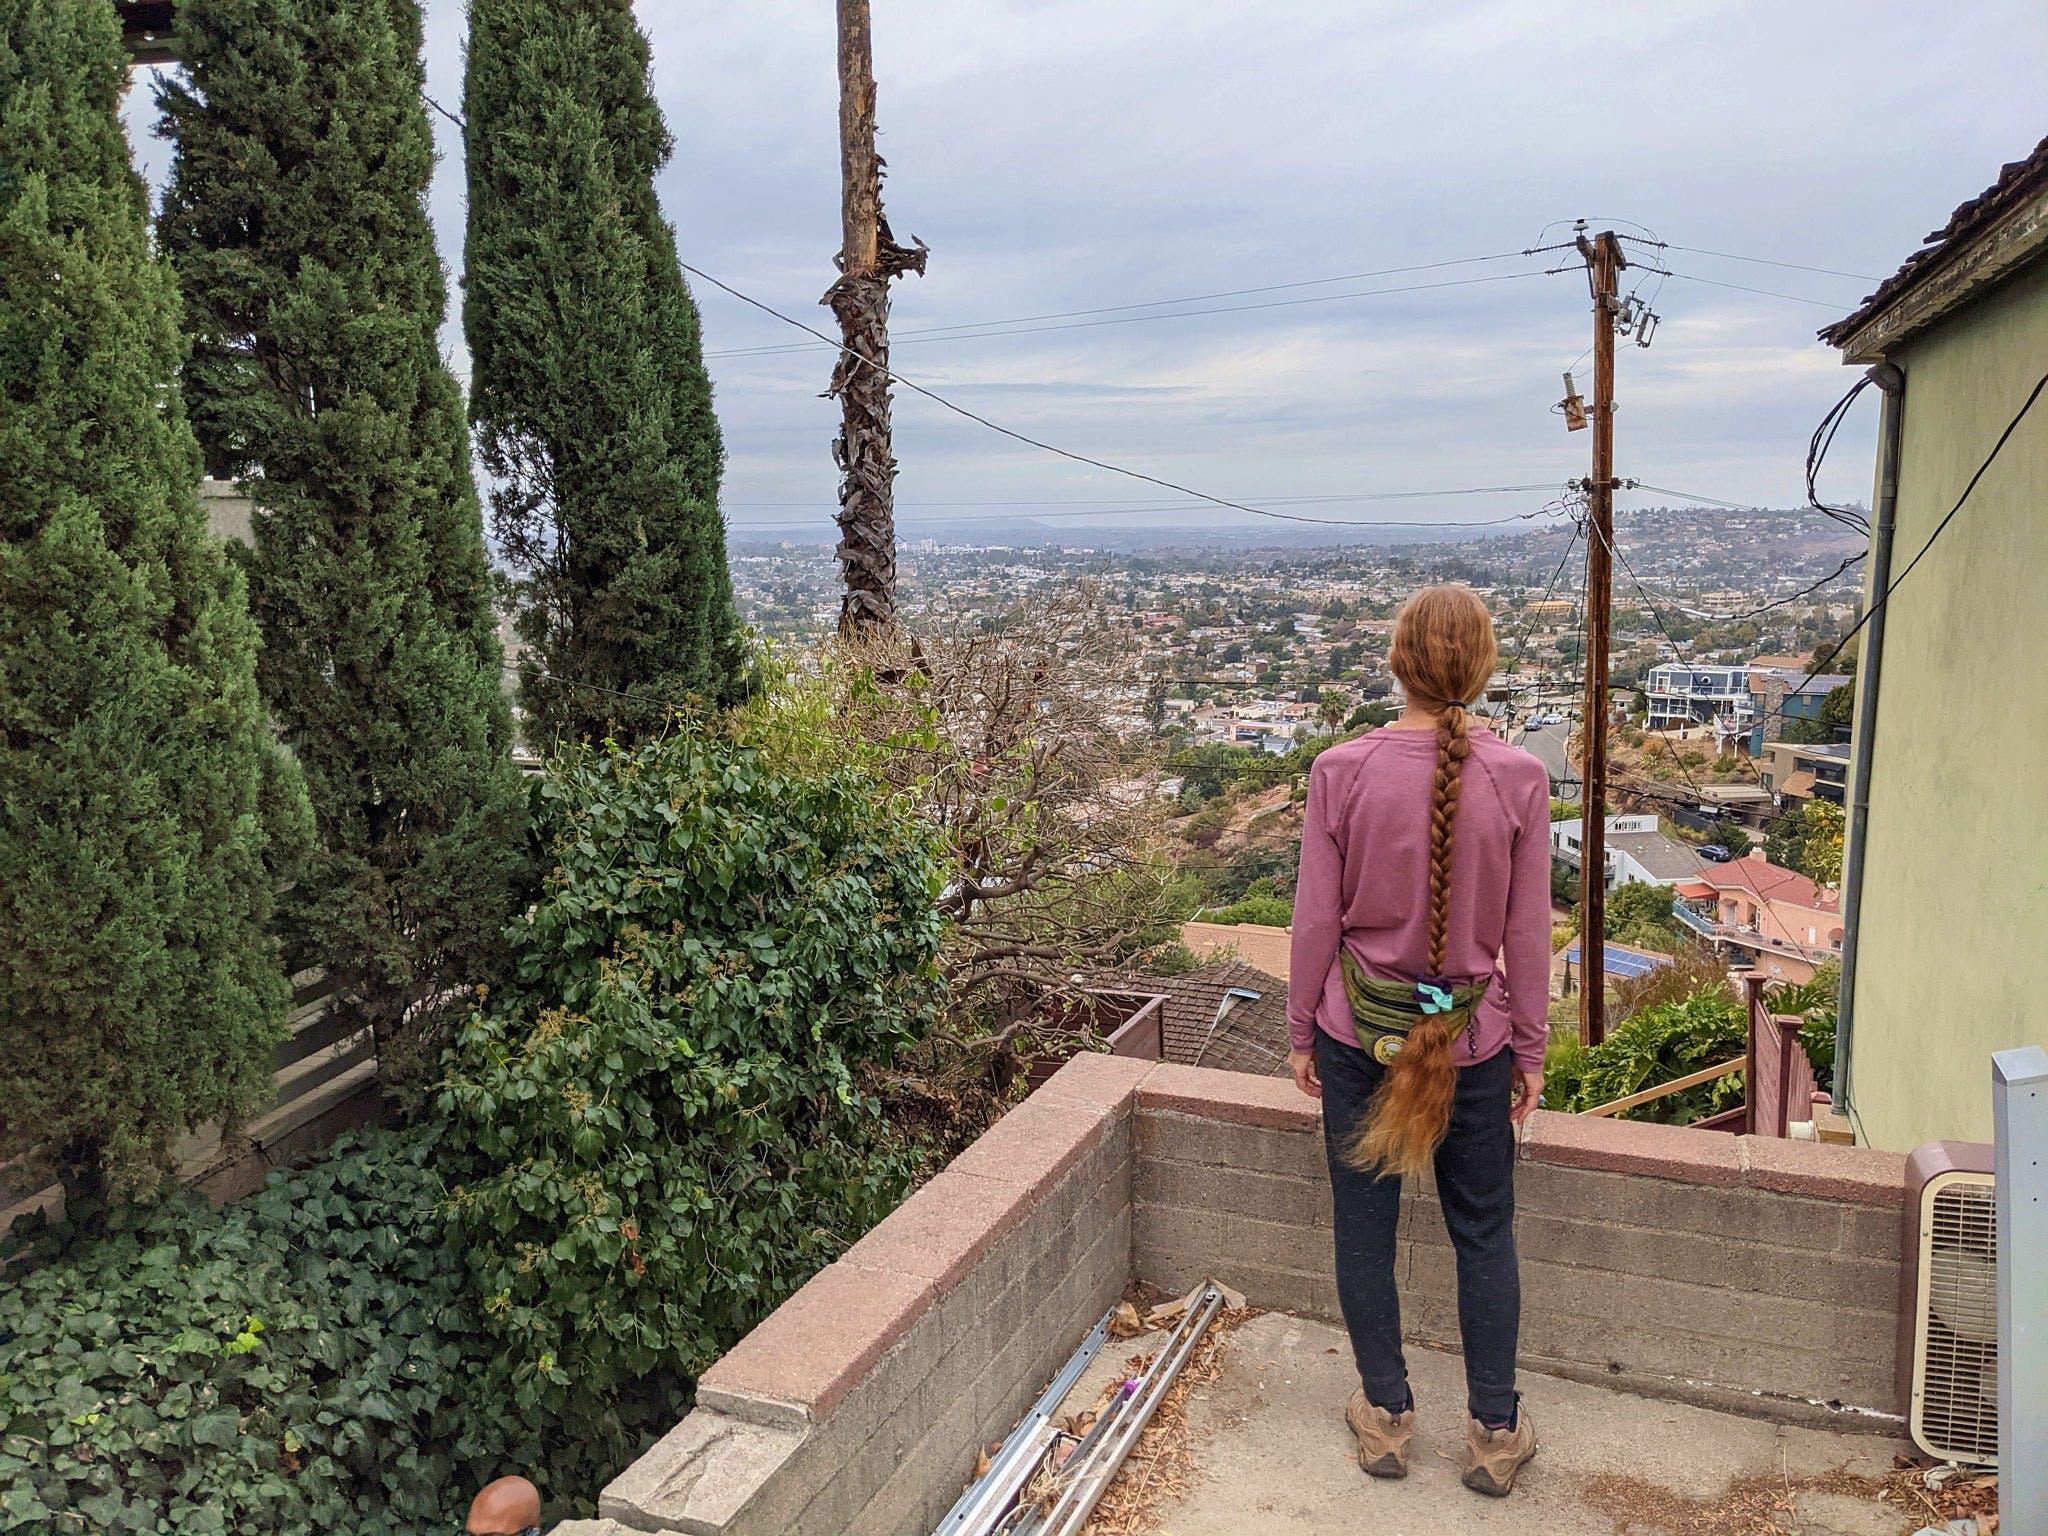 Woman overlooking the scenery on a stairway walk in La Mesa San Diego